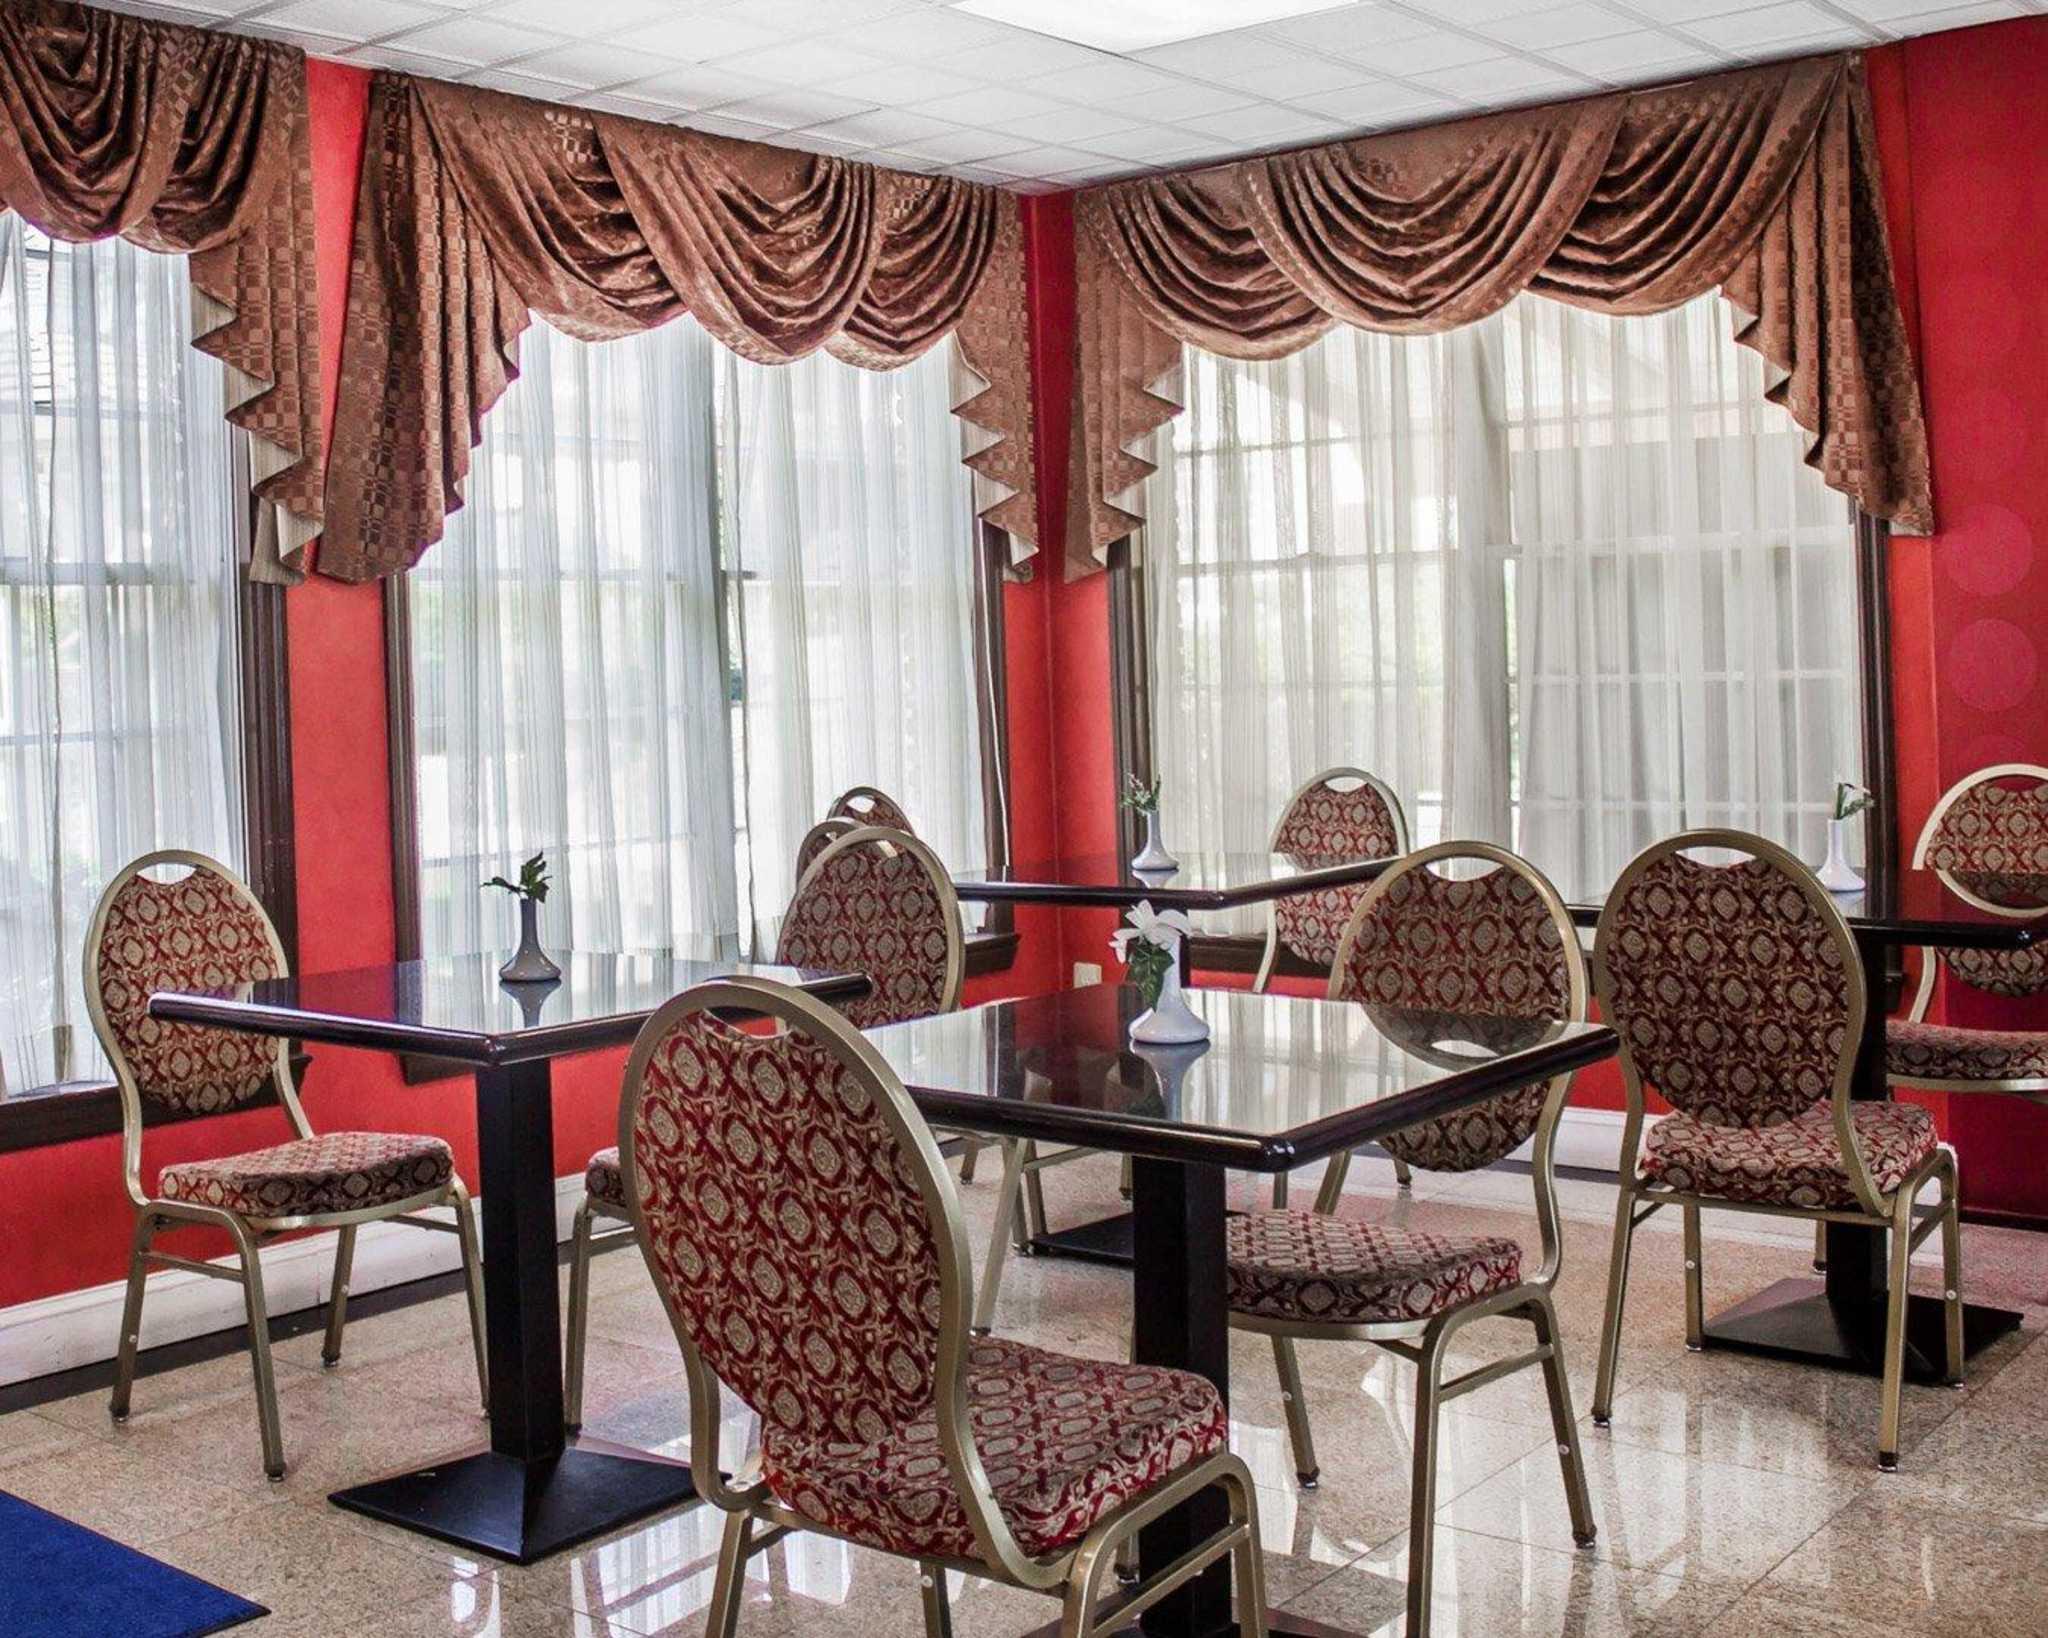 Rodeway Inn 270 W Jericho Tpke, Huntington Station, NY 11746 ...